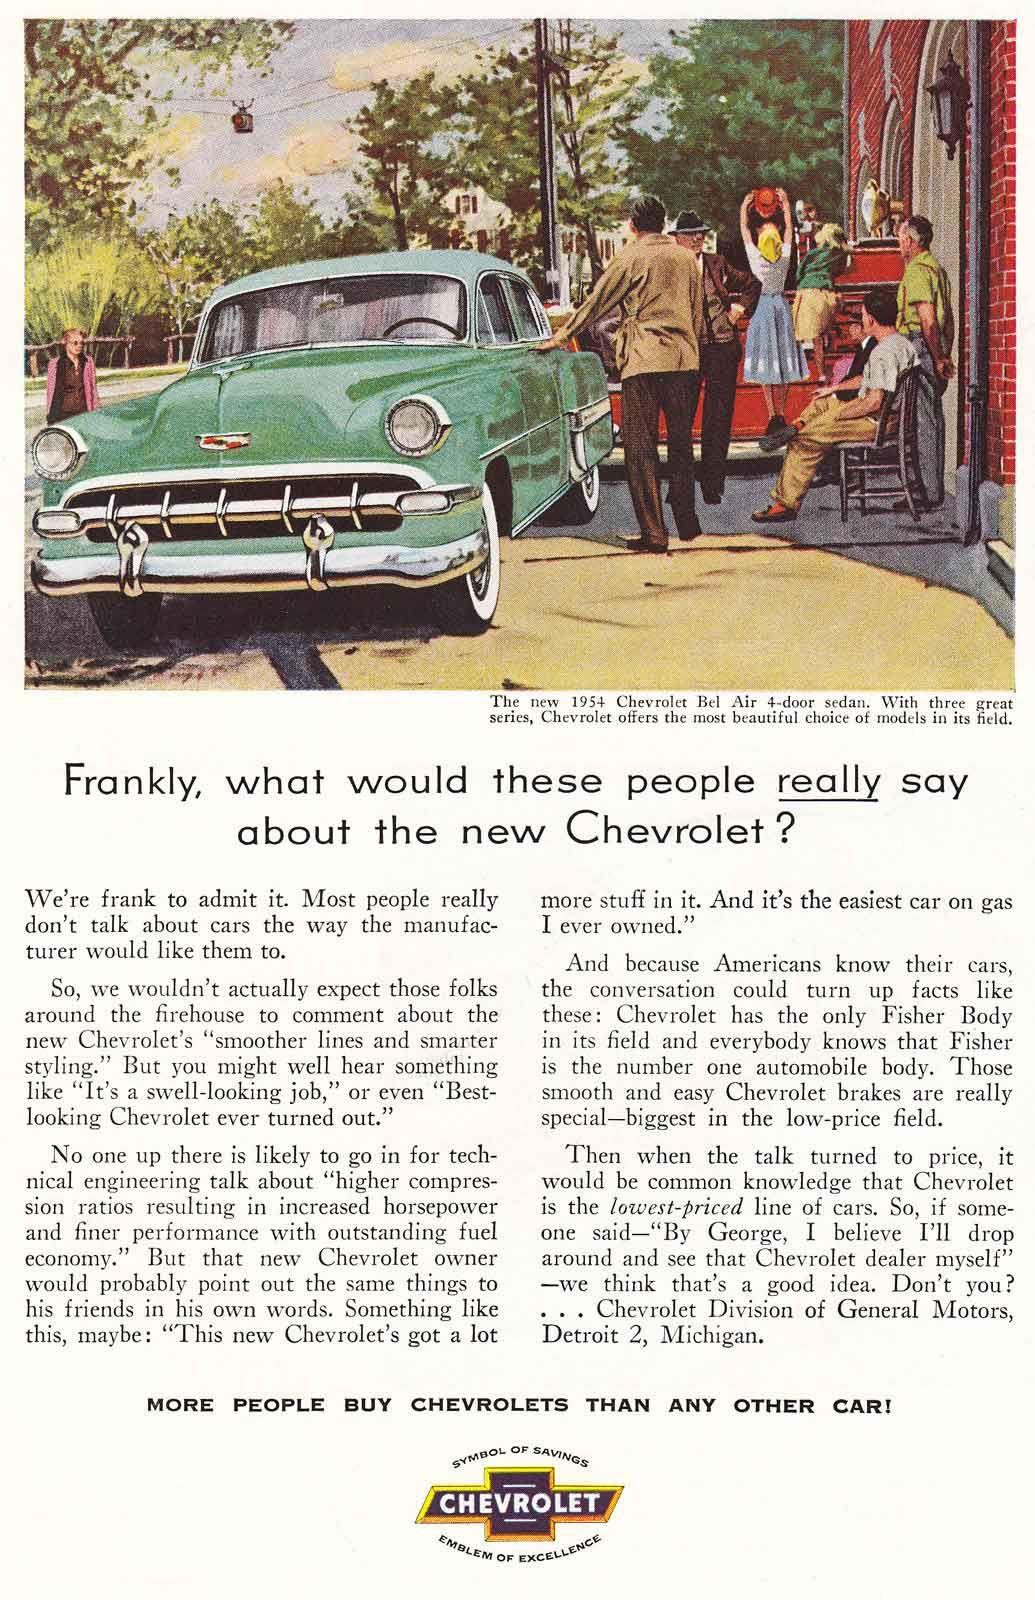 Chevy Bel Air, Car Advert 1957 Classic chevrolet